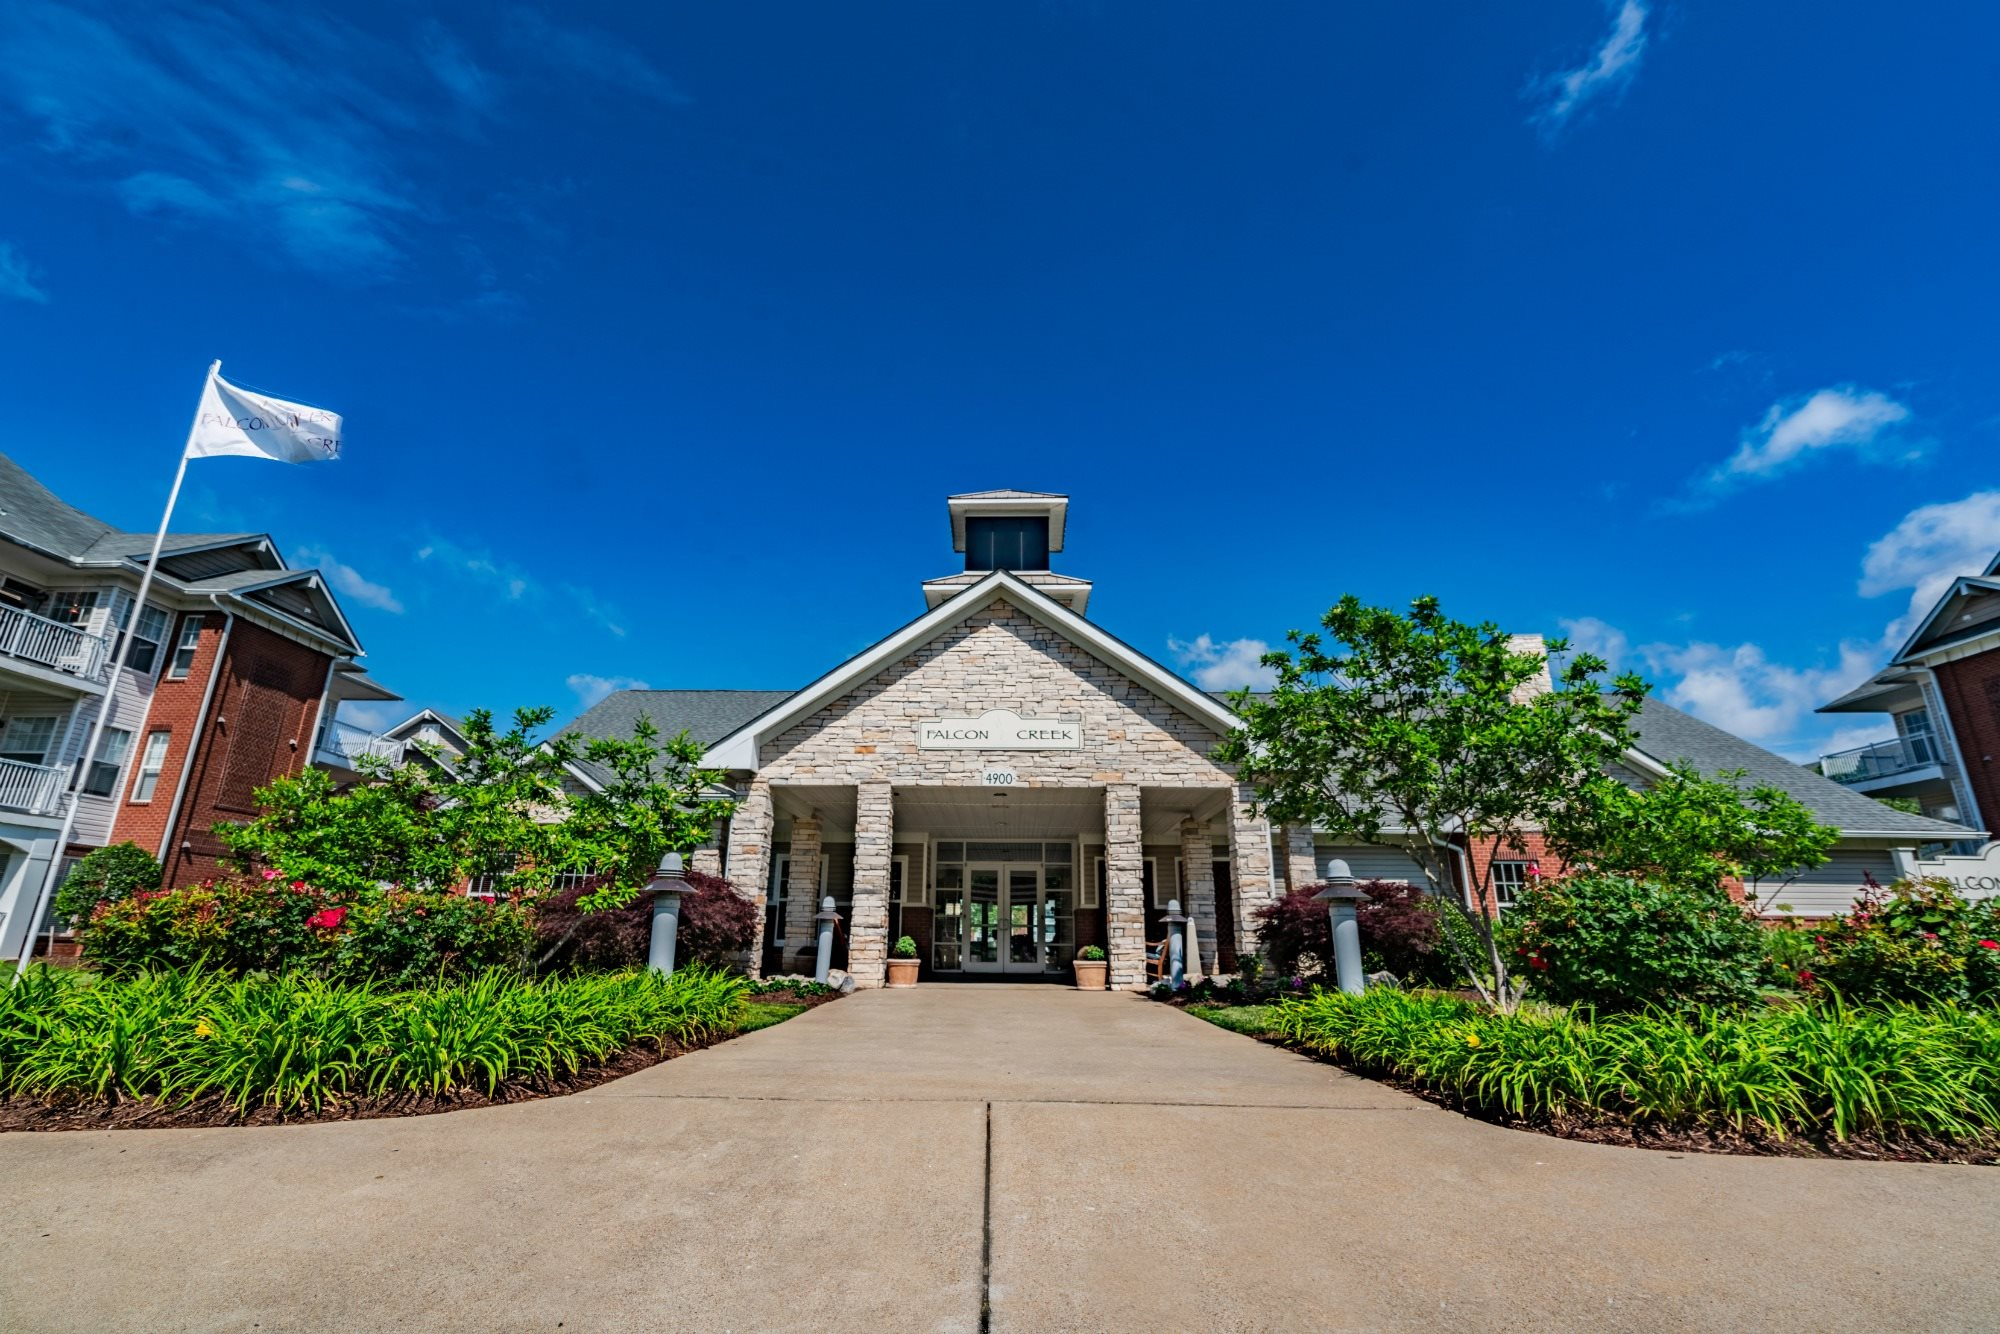 Falcon Creek Apartments in Hampton VA, 1 & 2 Bed Luxury Apartments